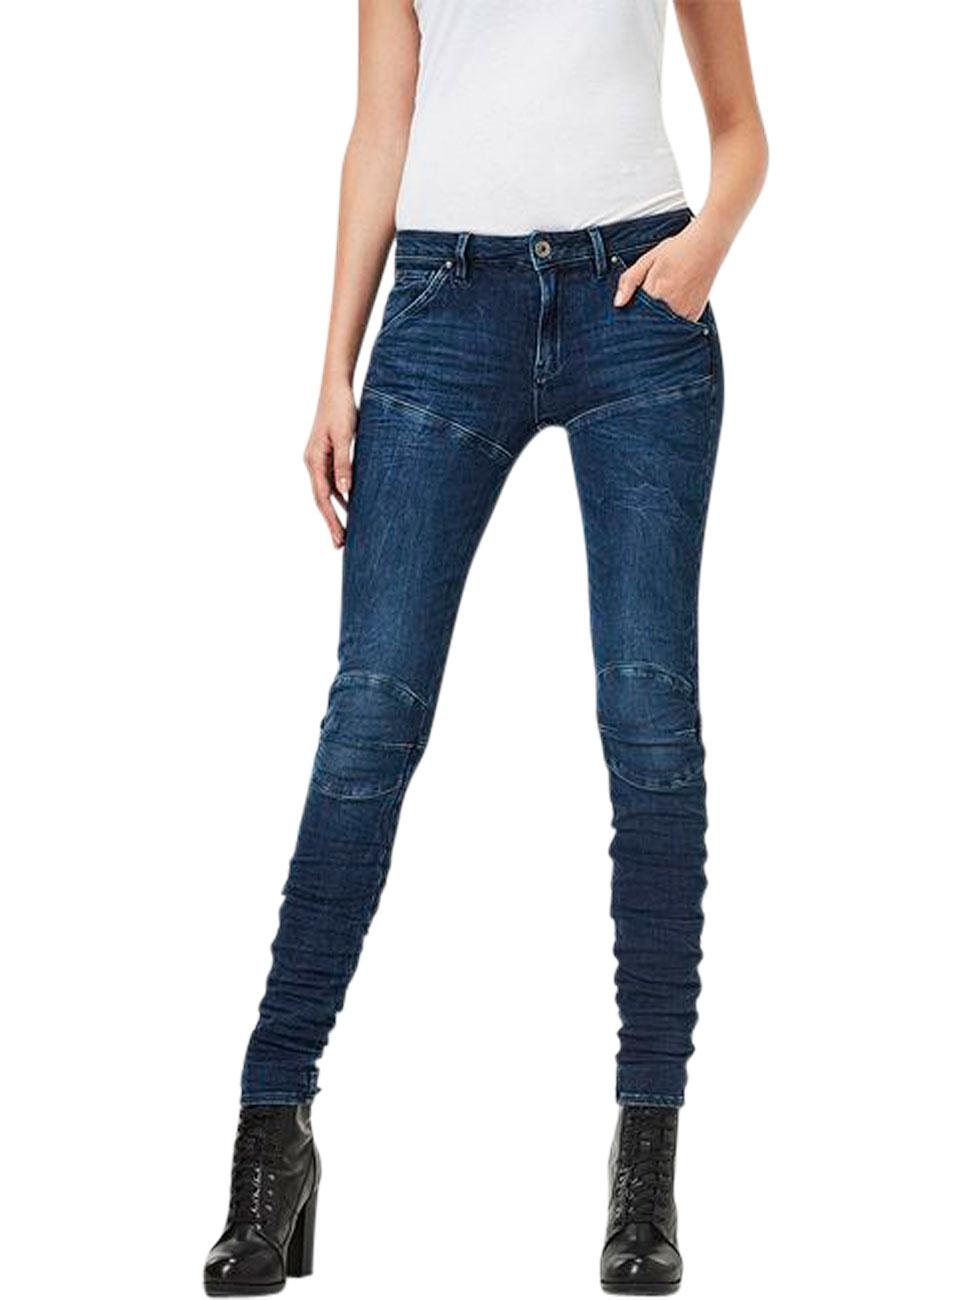 g star damen jeans 5620 g star elwood staq 3d mid waist blau 3d dark aged jeans direct de. Black Bedroom Furniture Sets. Home Design Ideas